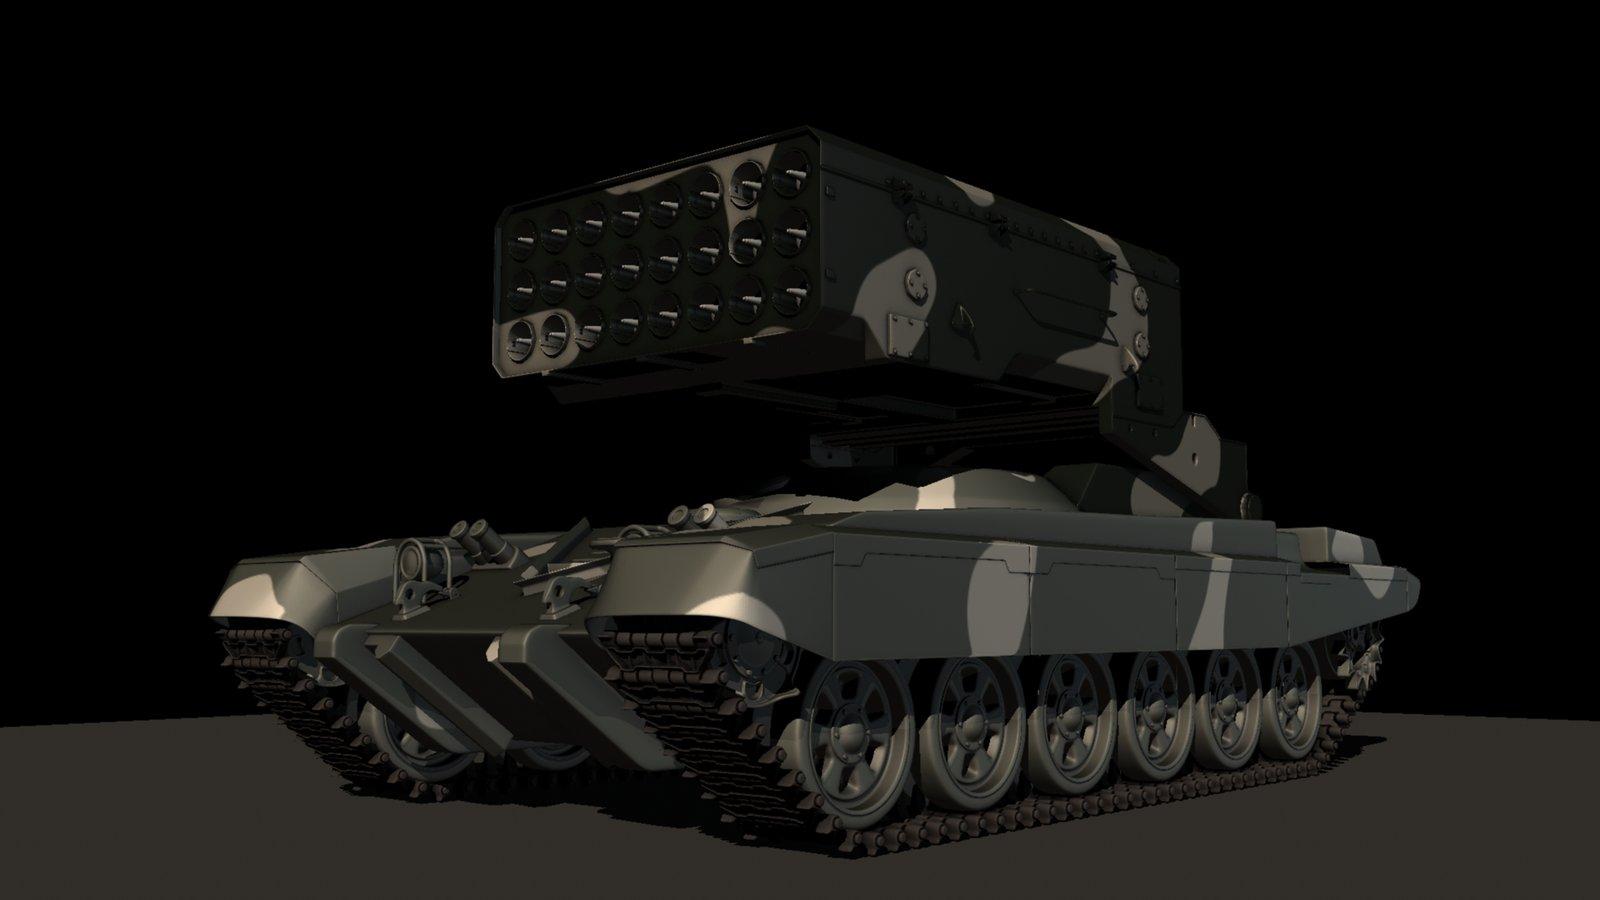 TOS-1A-color-3_4 - smooth.jpeg